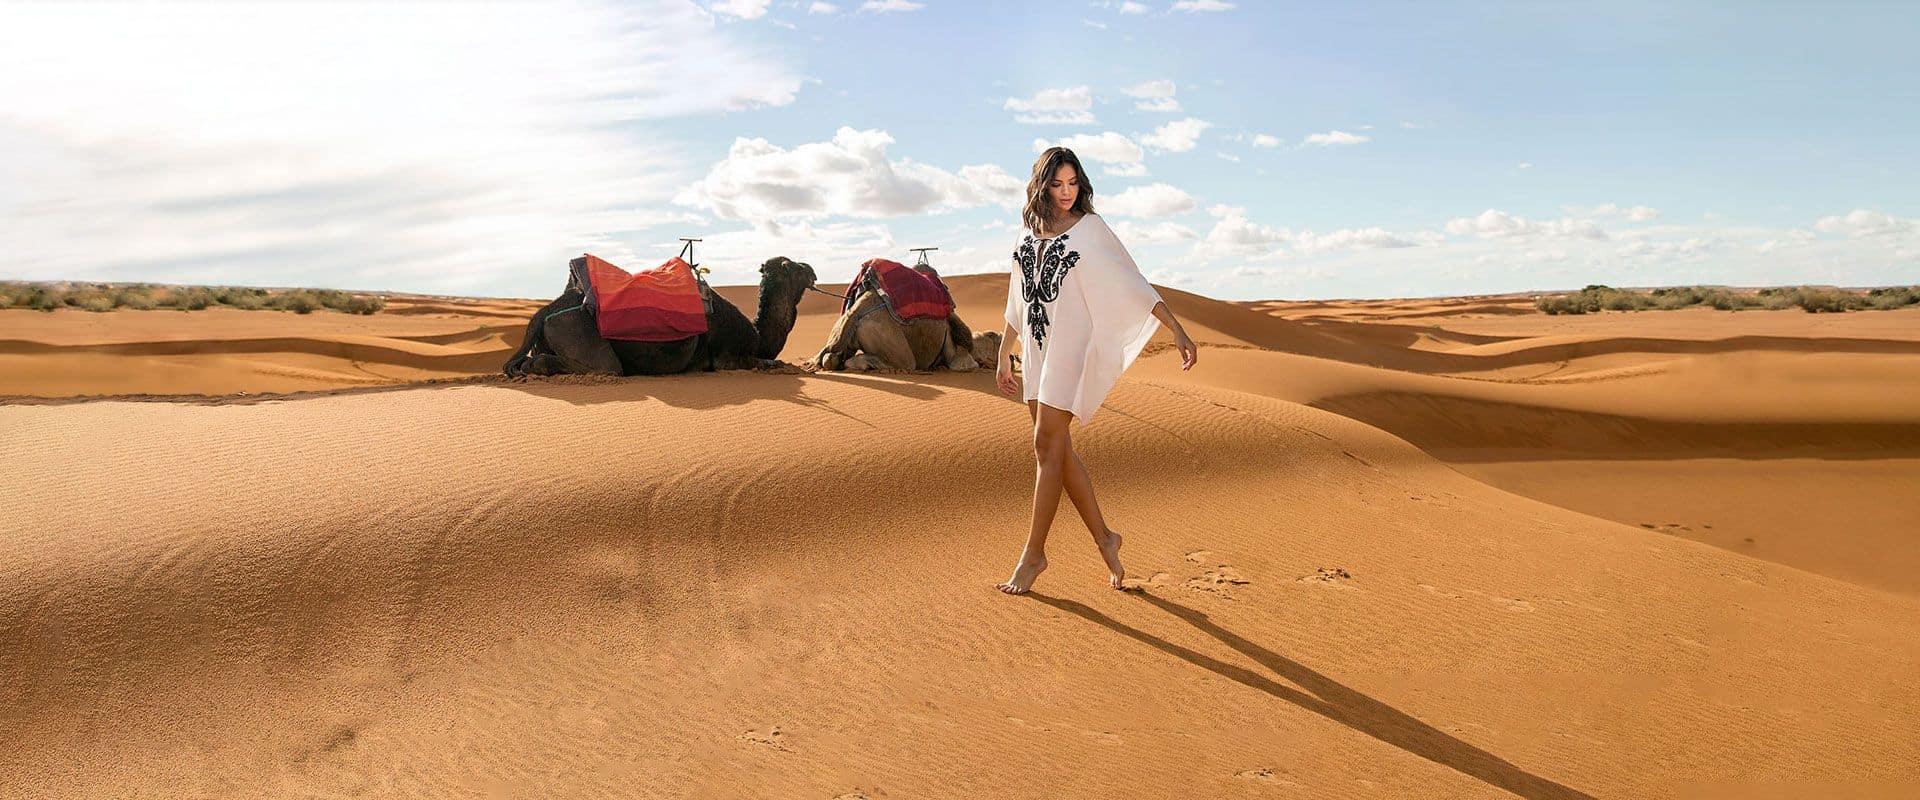 Larissa-Minatto-Verano-2020-Beach-Sahara-Blusa